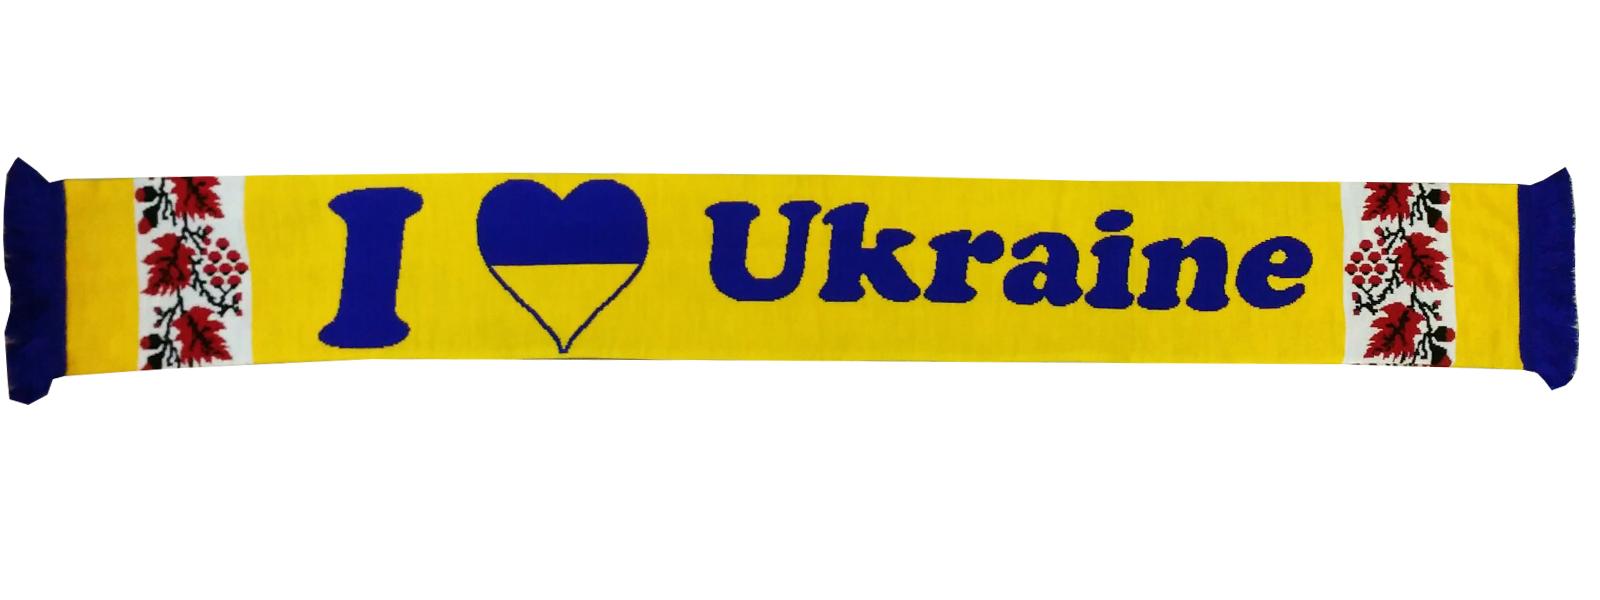 8701acafb3ed Шарф Украина (4) - Футбольные шарфы - токка, металлист, футбол ...